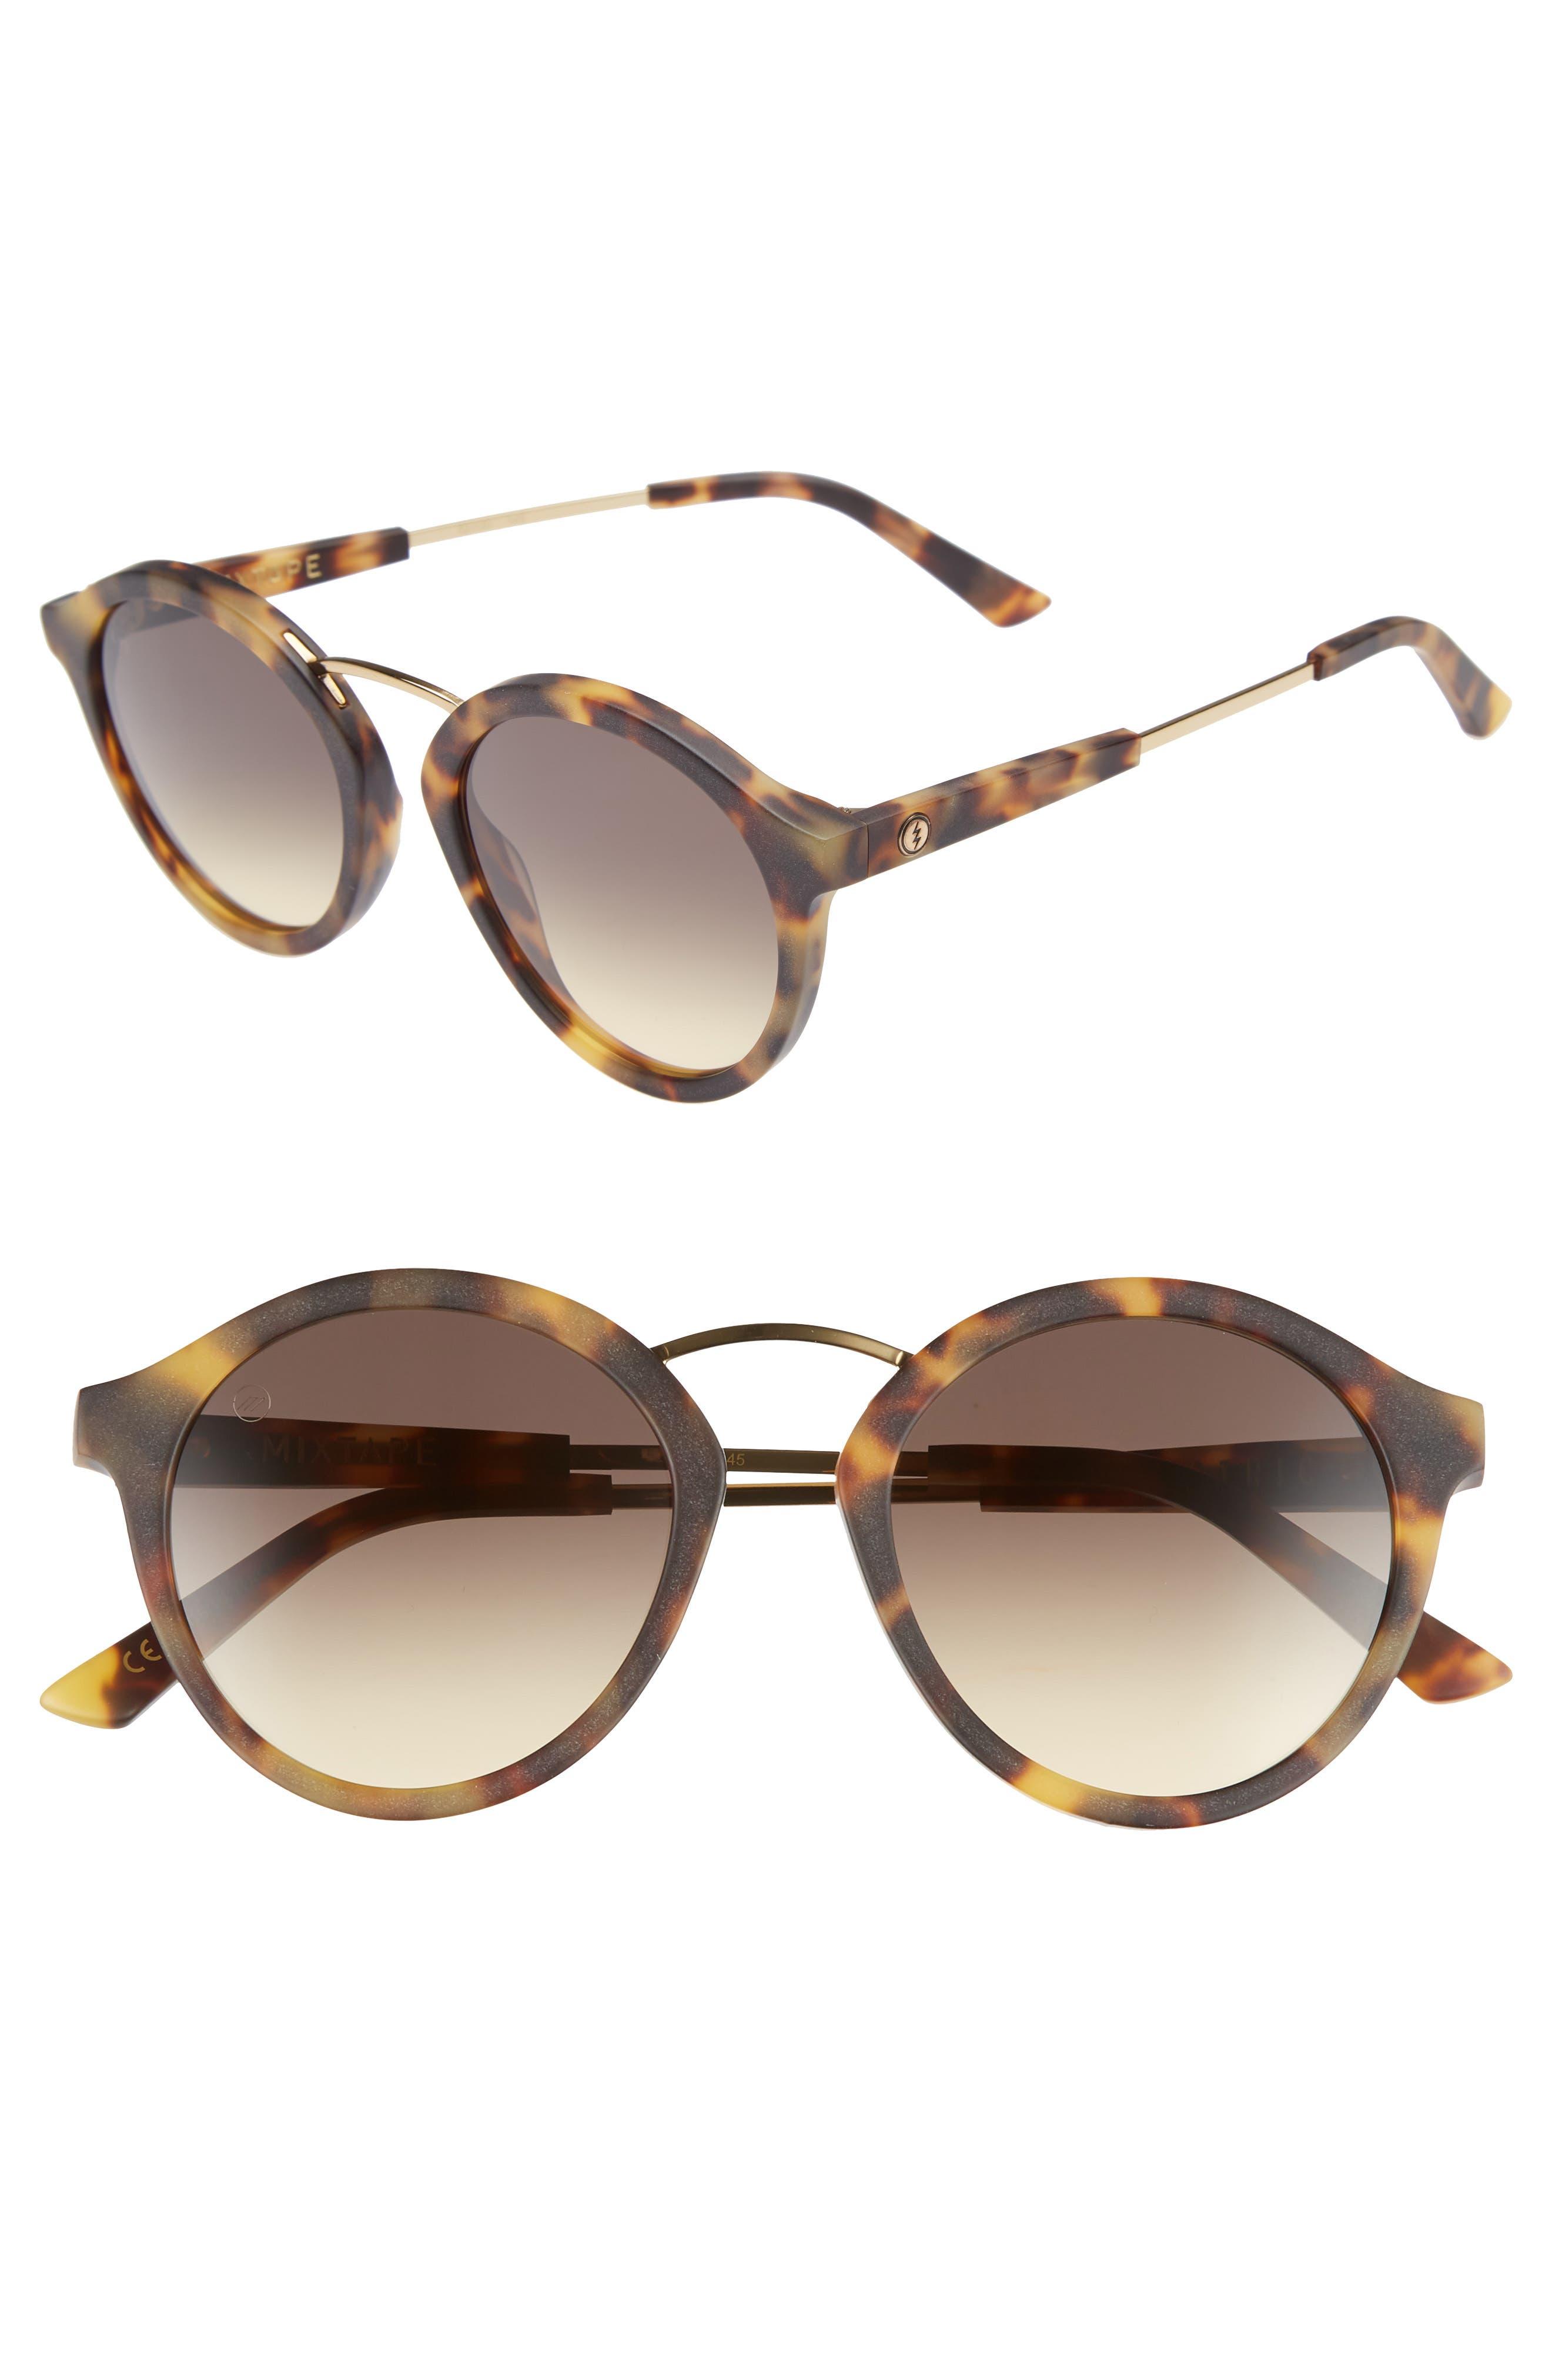 Mix Tape 52mm Mirrored Round Sunglasses,                         Main,                         color, MATTE TORTOISE/ BLACK GRADIENT